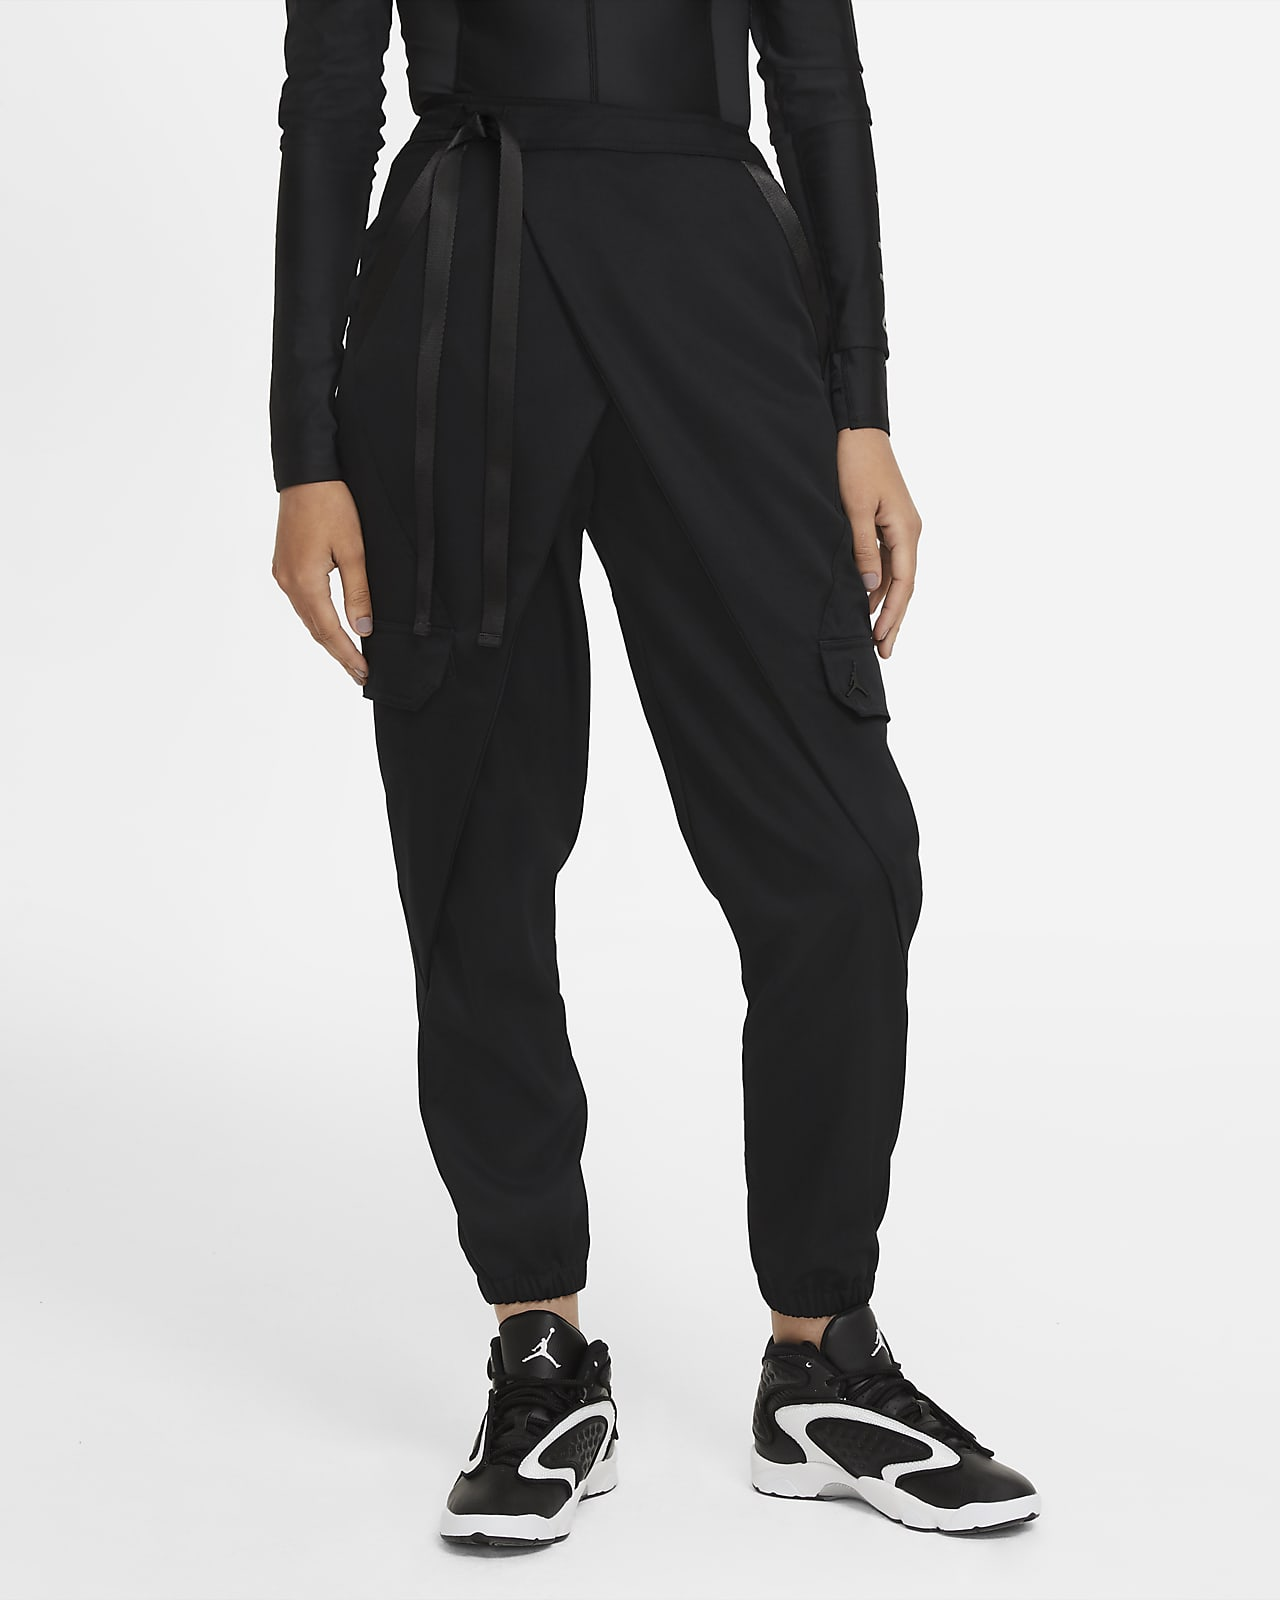 Pantalon Utility Jordan Future Primal pour Femme